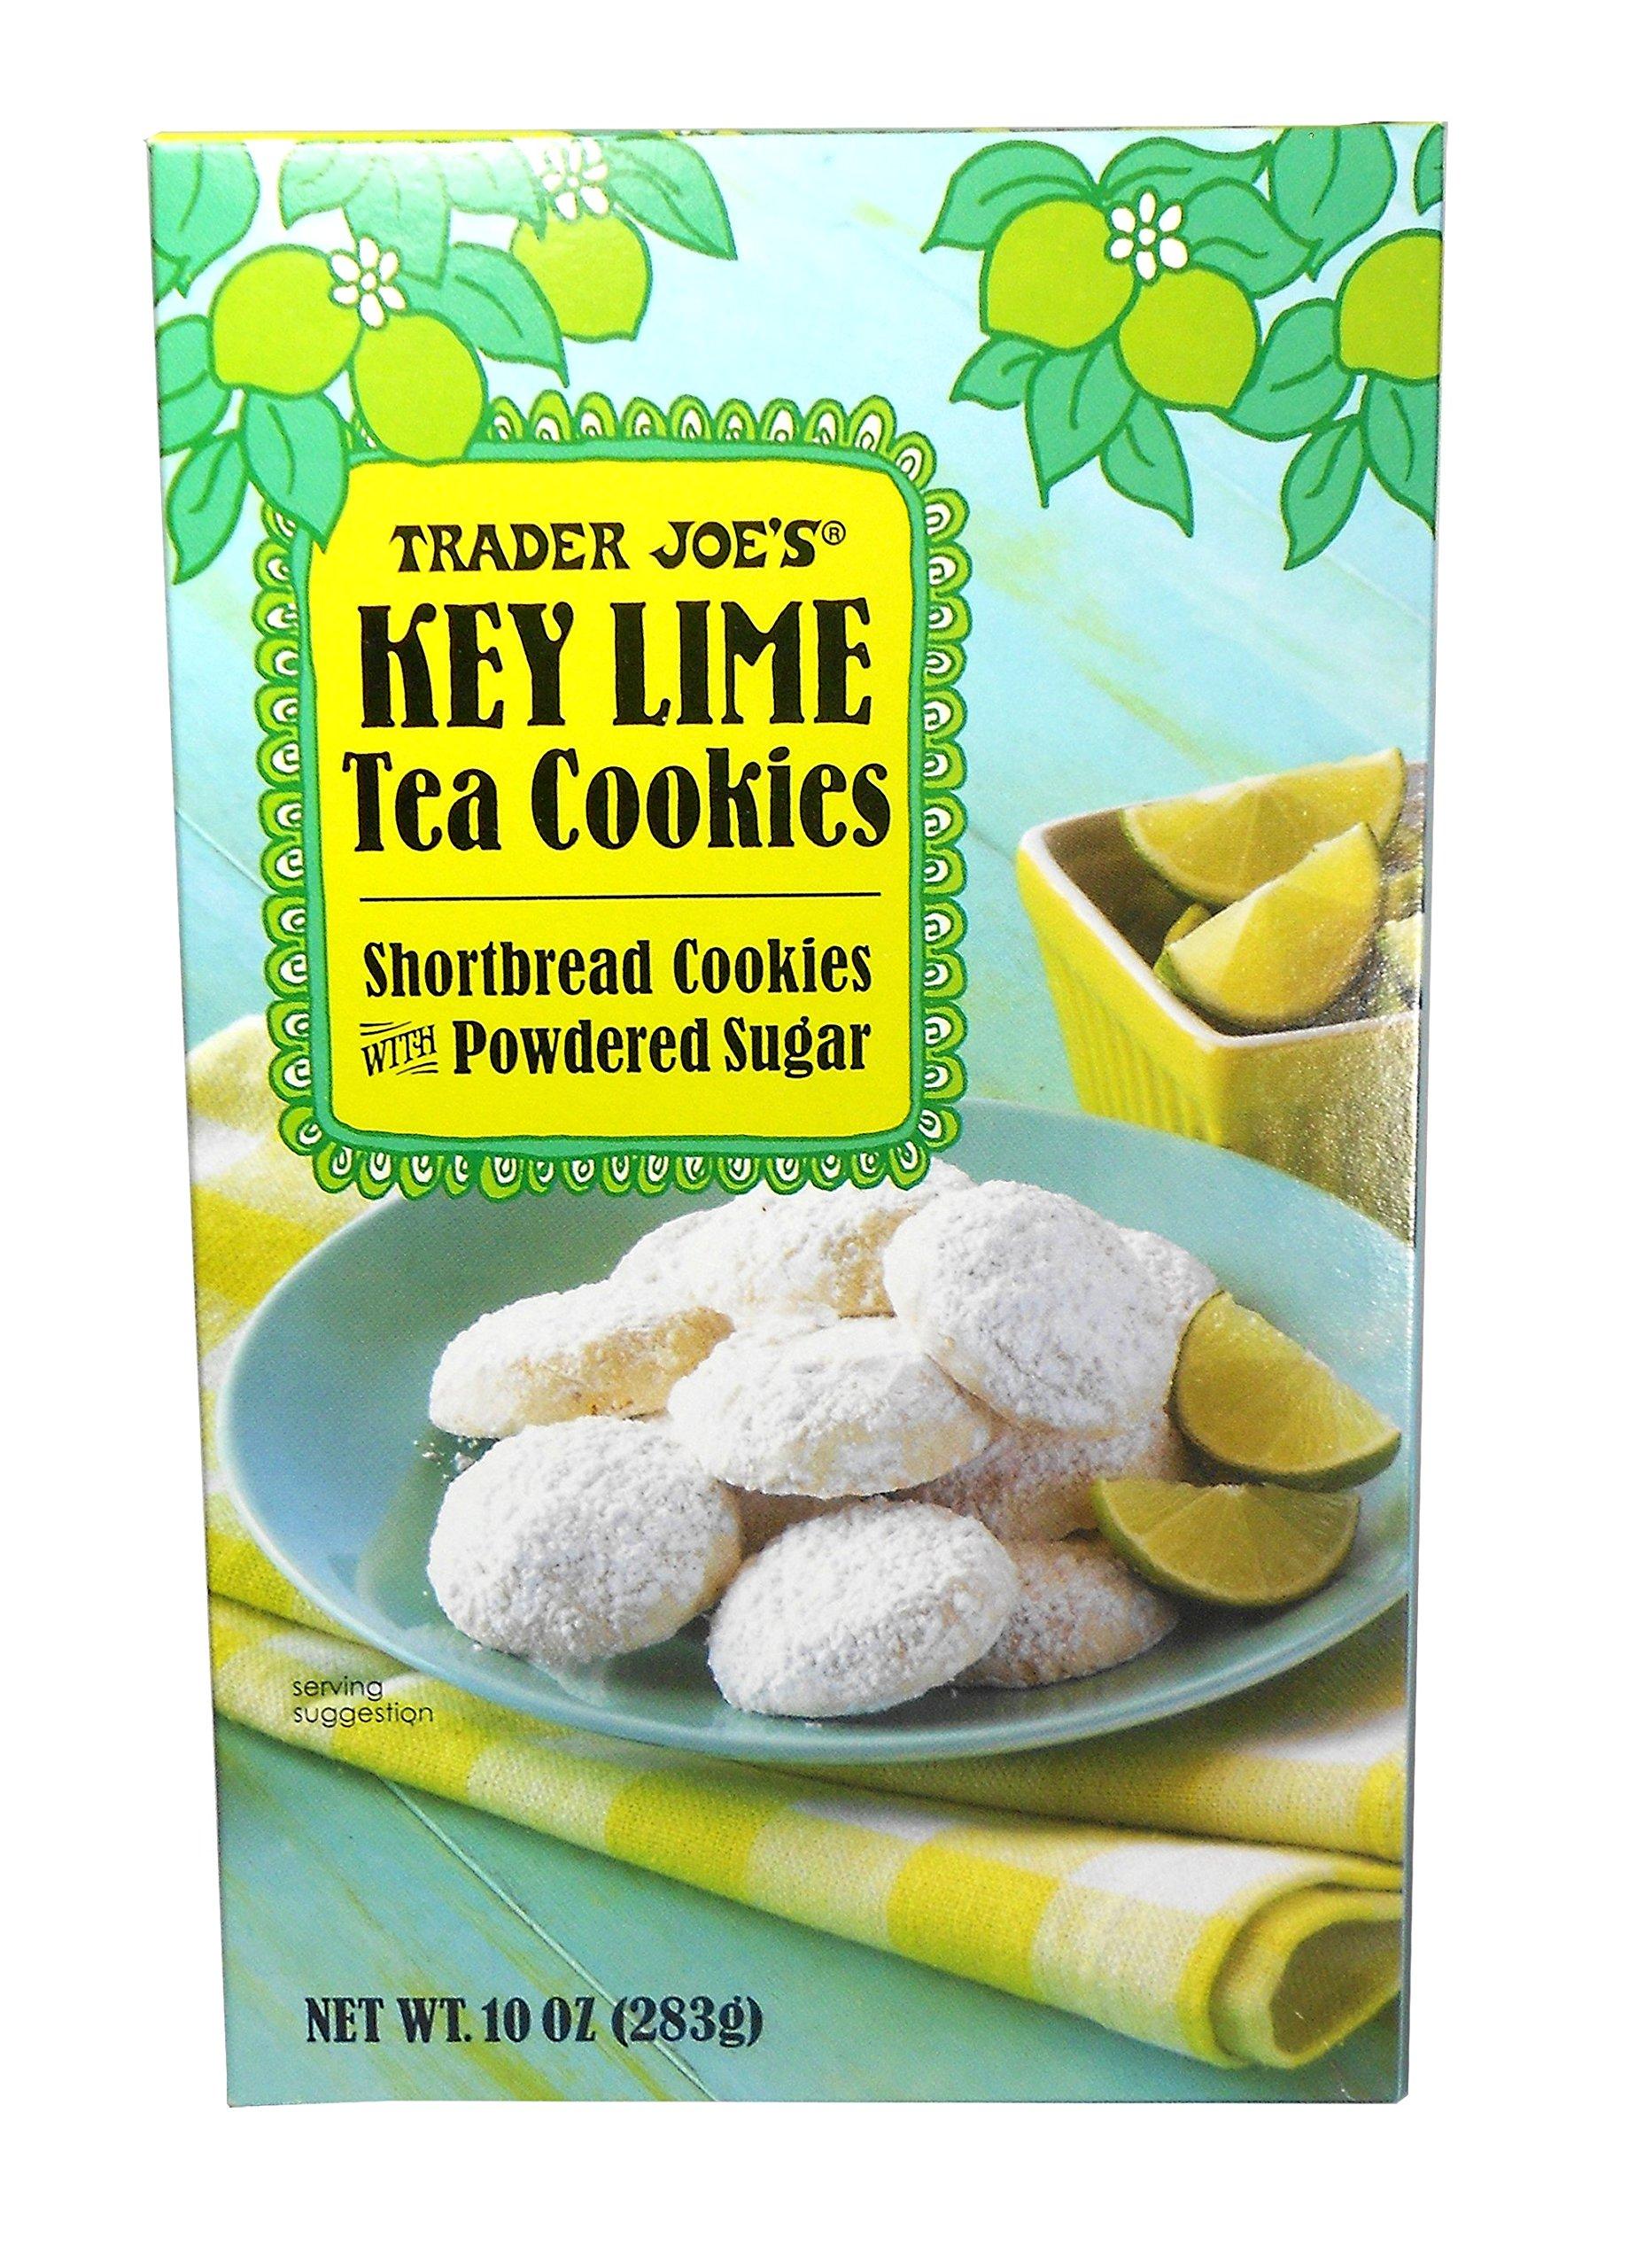 Trader Joe's Key Lime Shortbread Tea Cookies with Powdered Sugar 10 Oz. by Trader Joe's